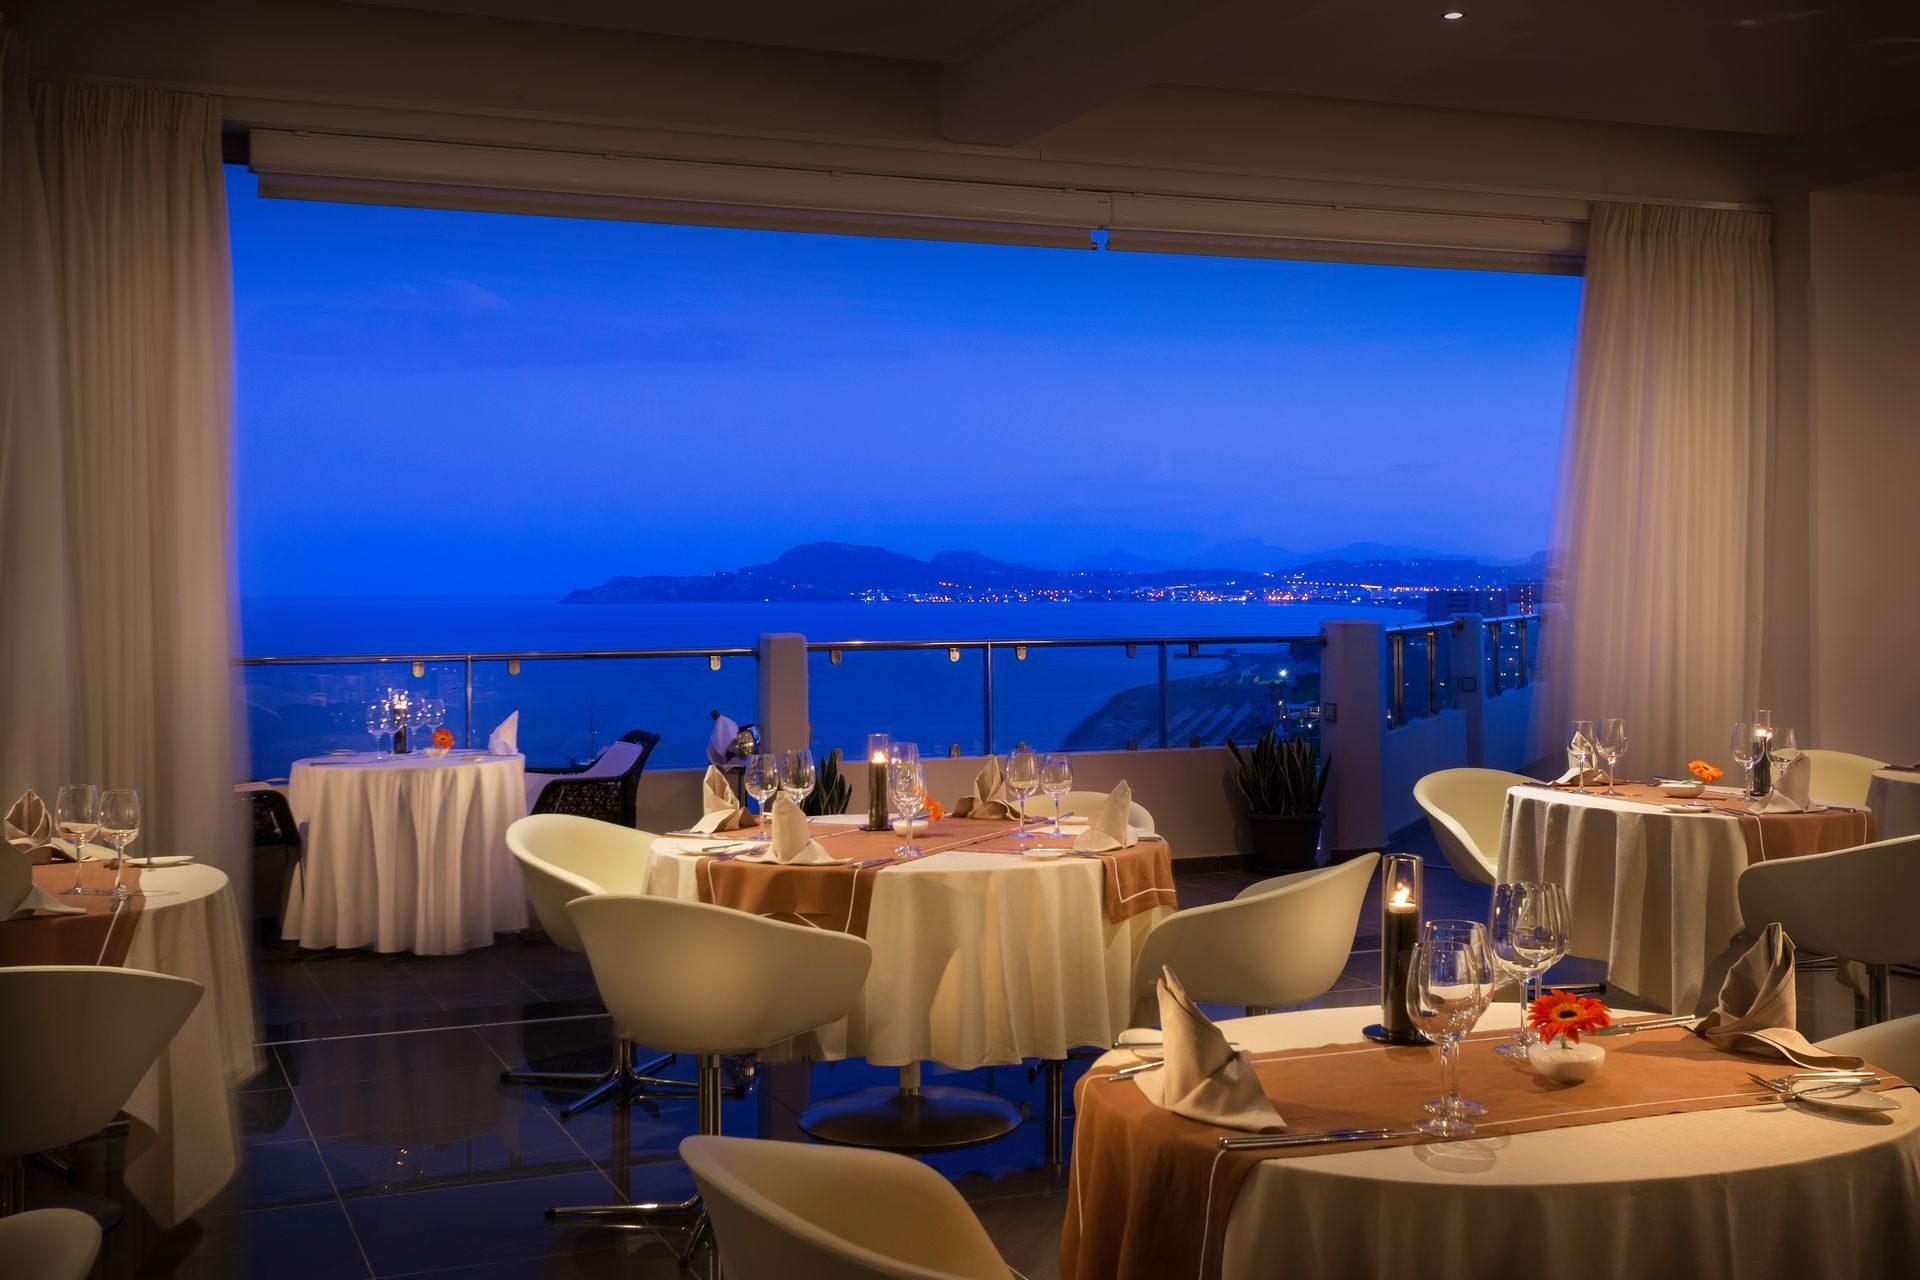 314_Noble_Gourmet_Restaurant_ELYSIUM_result